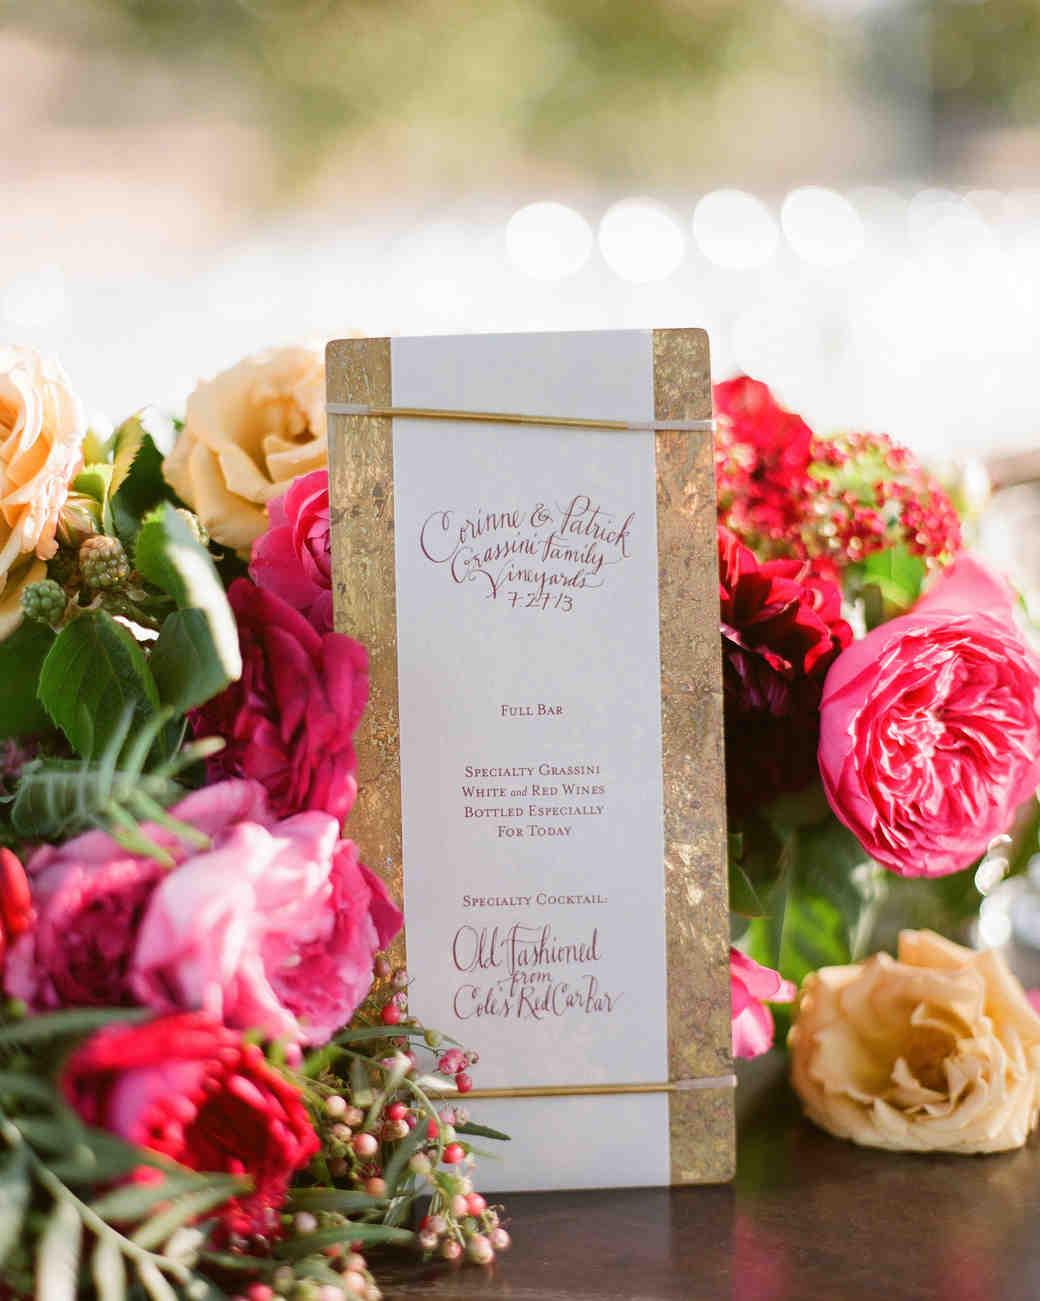 corrine-patrick-wedding-santa-ynez-44450003-1-s110842-0215.jpg